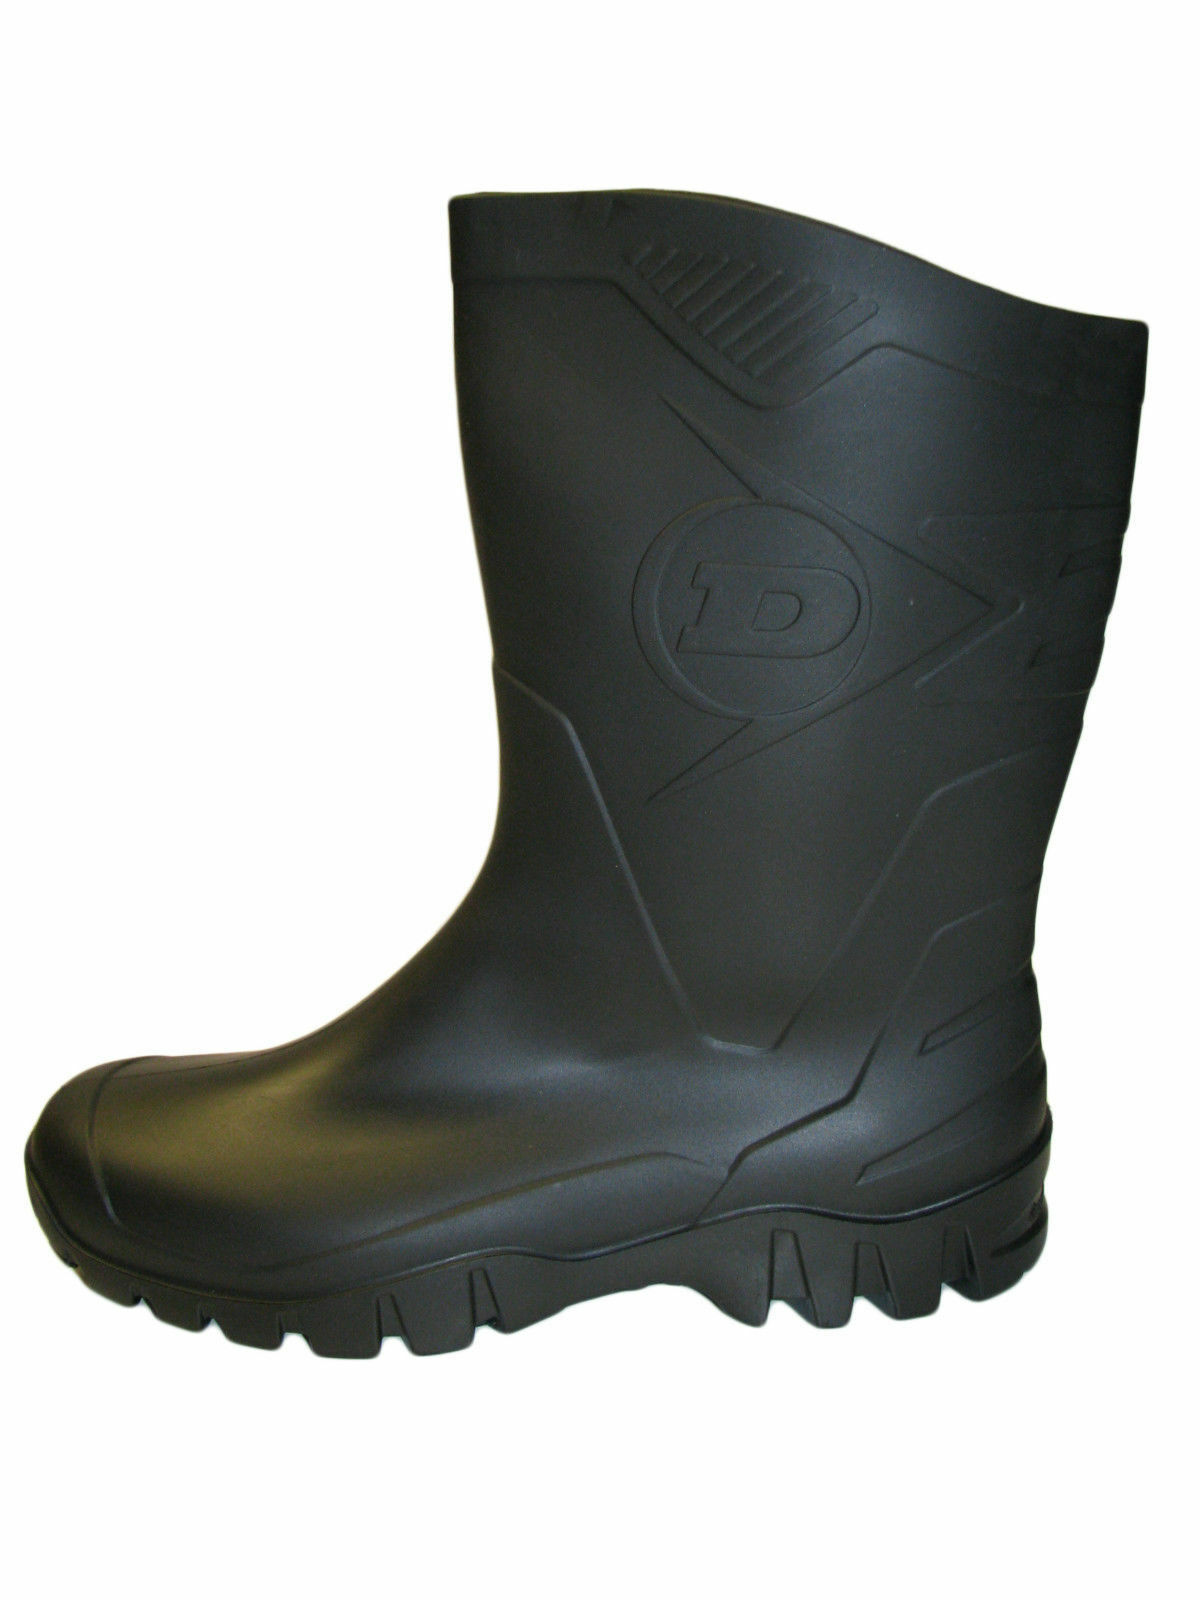 Unisex Dunlop Half Height Wide Leg Wellies Black sizes 4 to 12